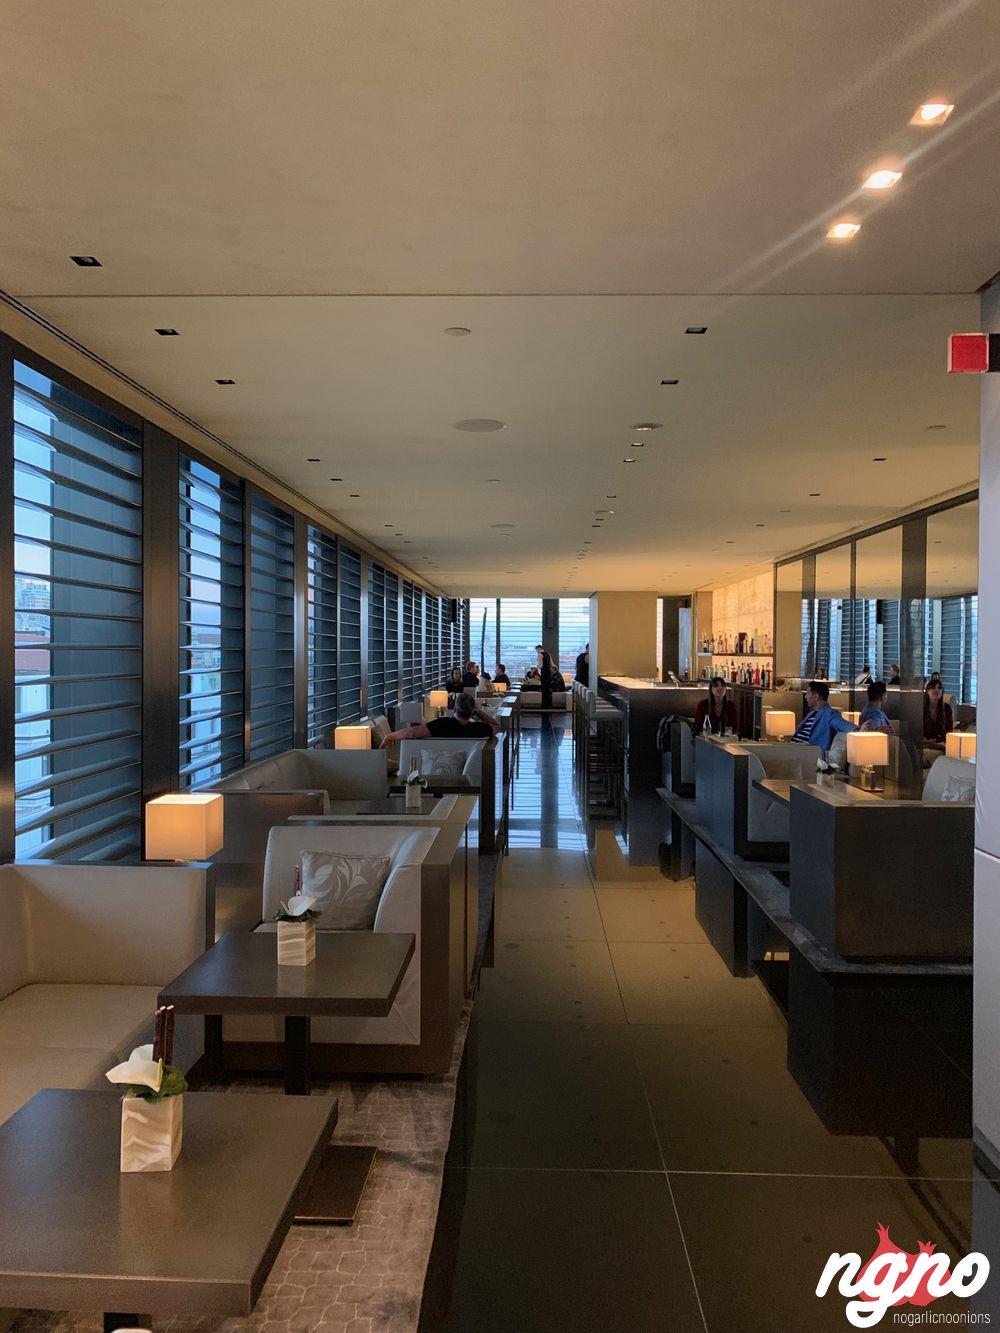 armani-hotel-dinner-nogarlicnoonions-662019-07-01-07-09-54